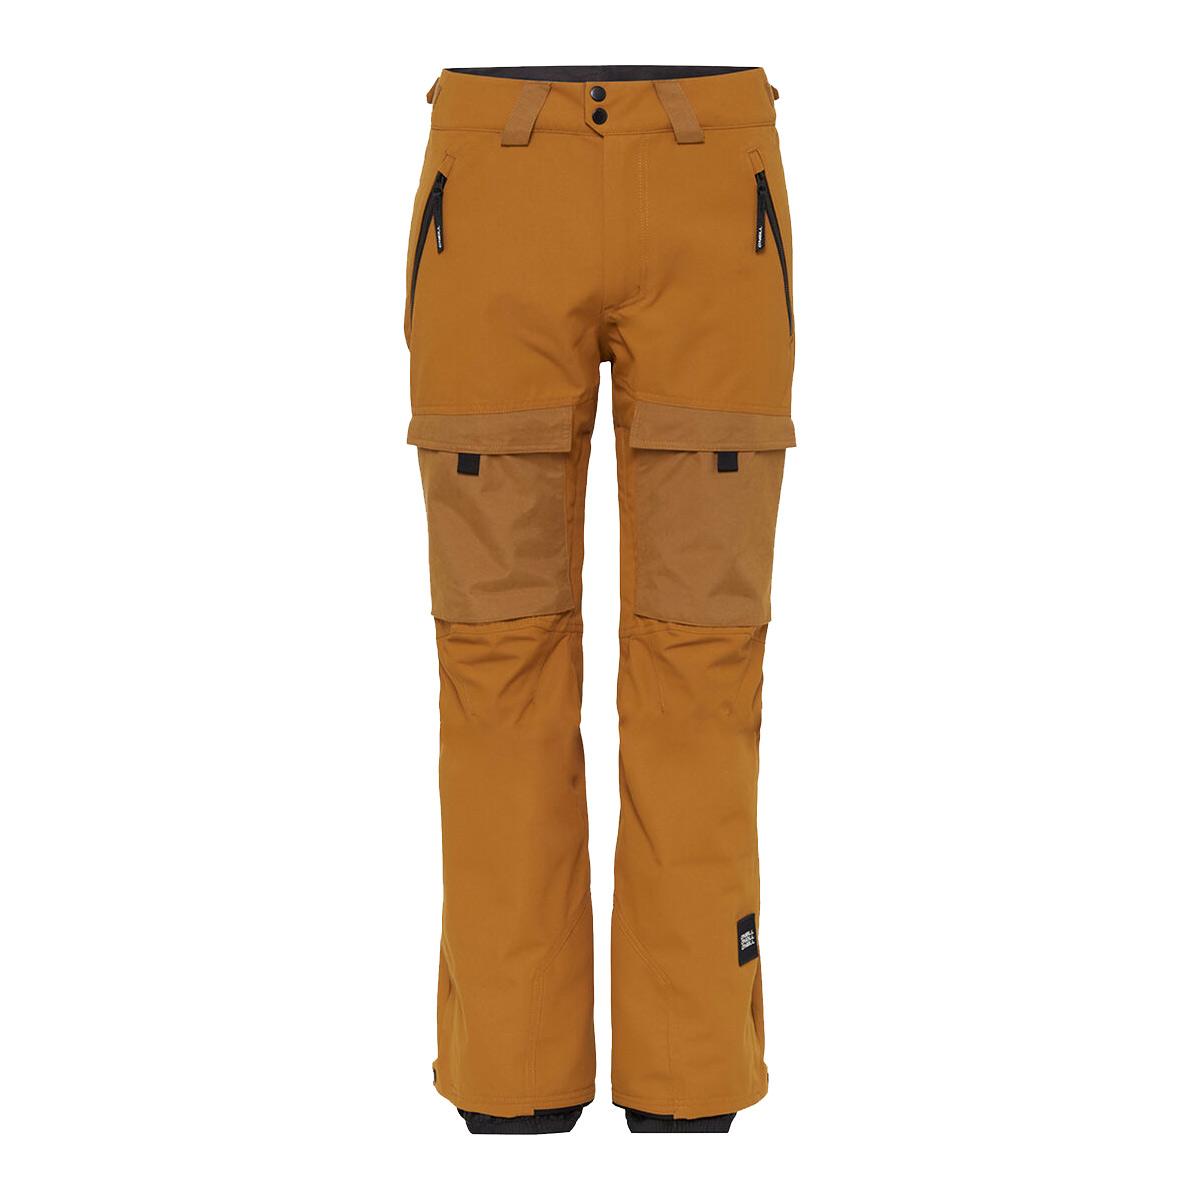 ONEILL PM Cargo Pants Pantalon Esqui Y Snowboard para Hombre